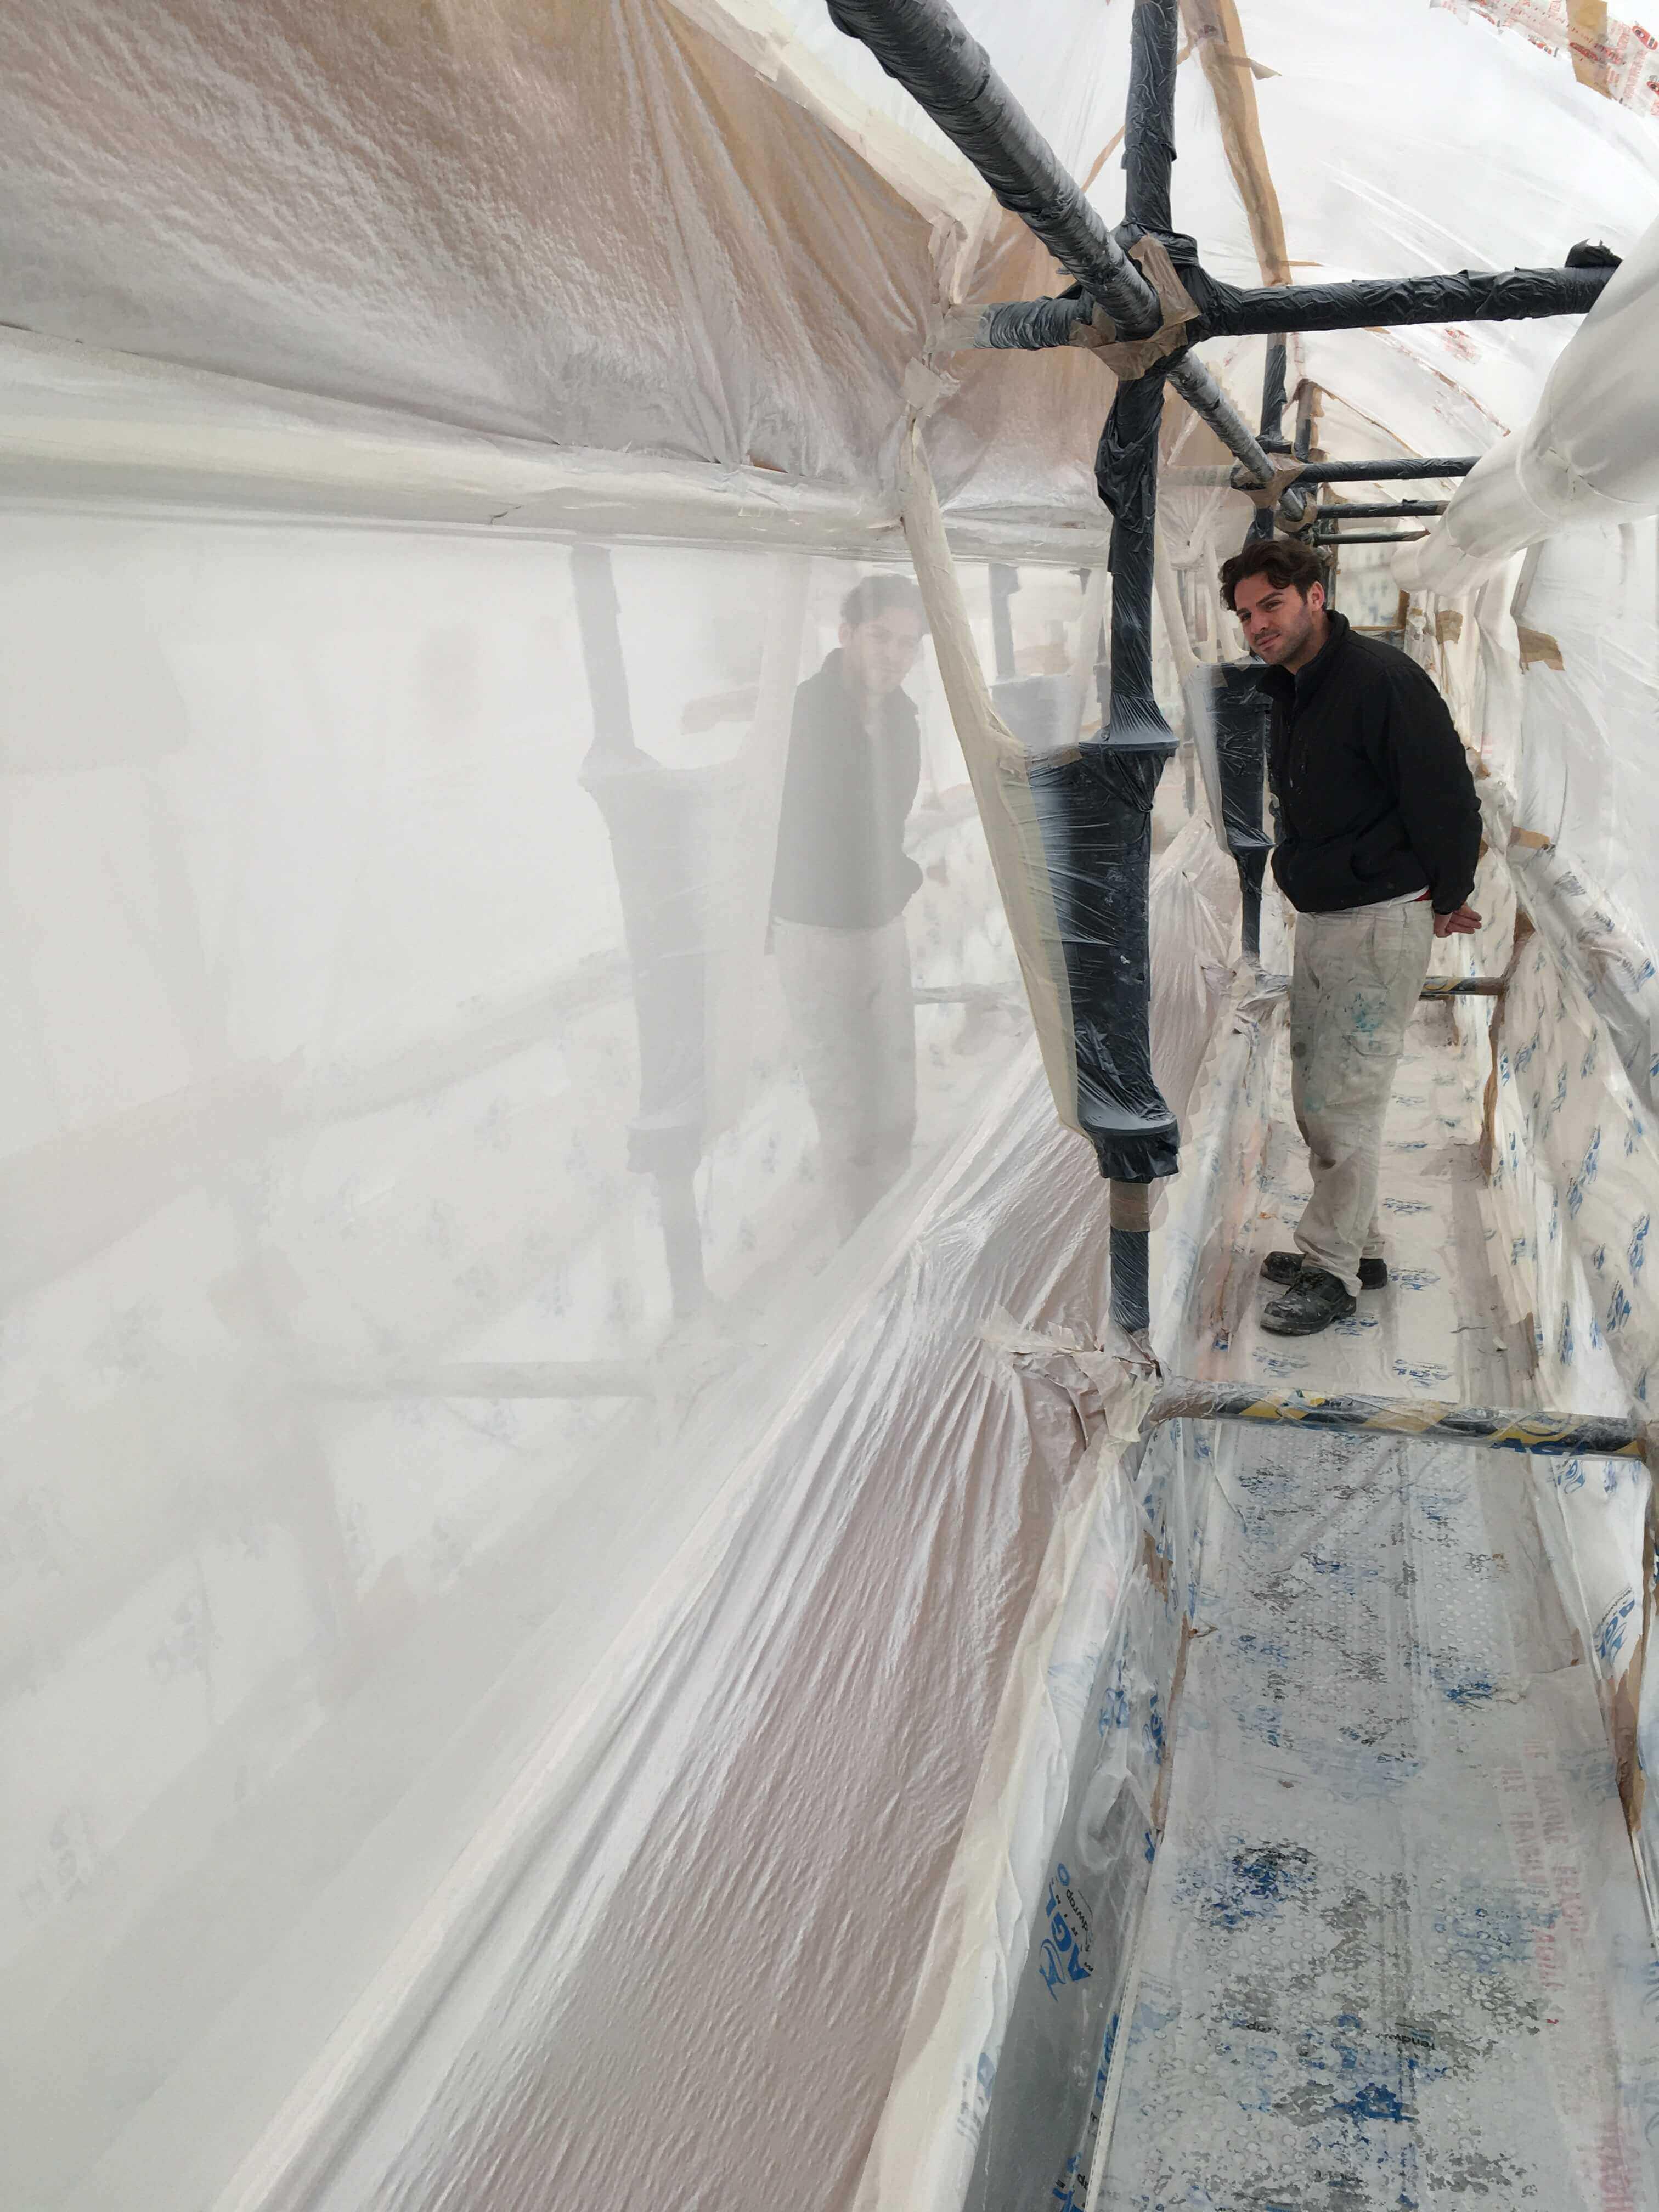 Superstructure repaint 2